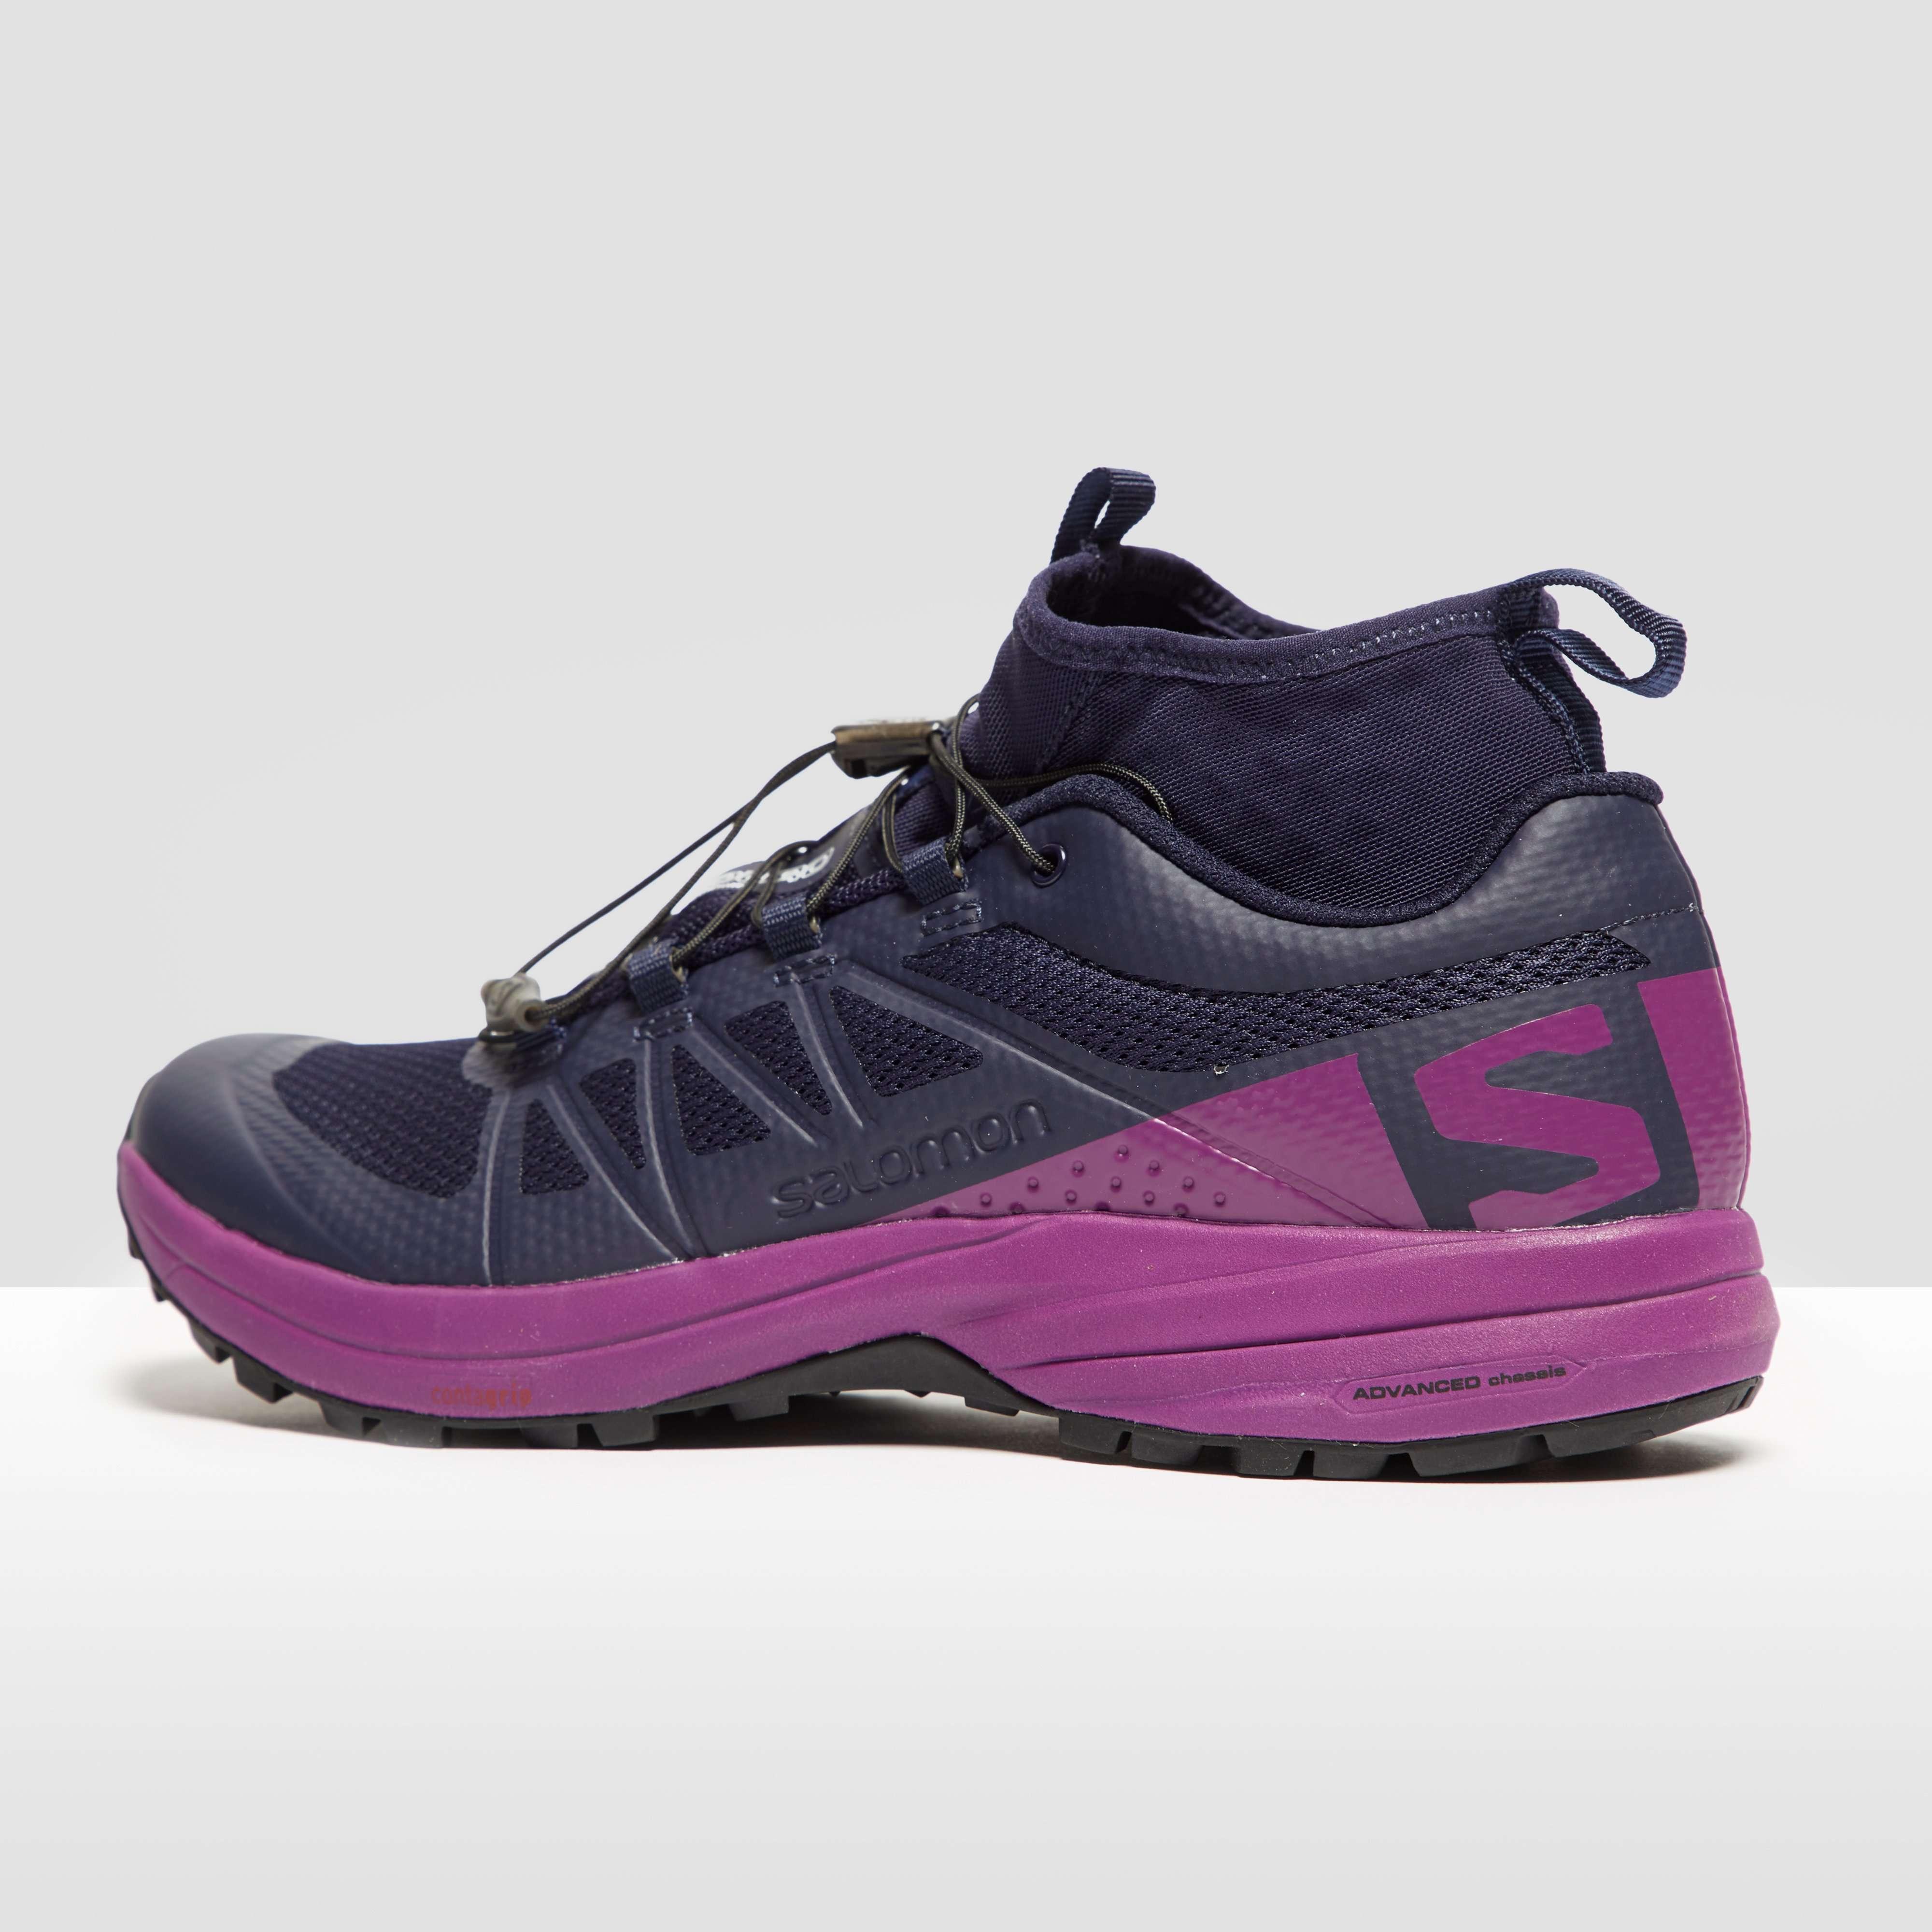 Salomon XA Enduro Women's Trail Running Shoes